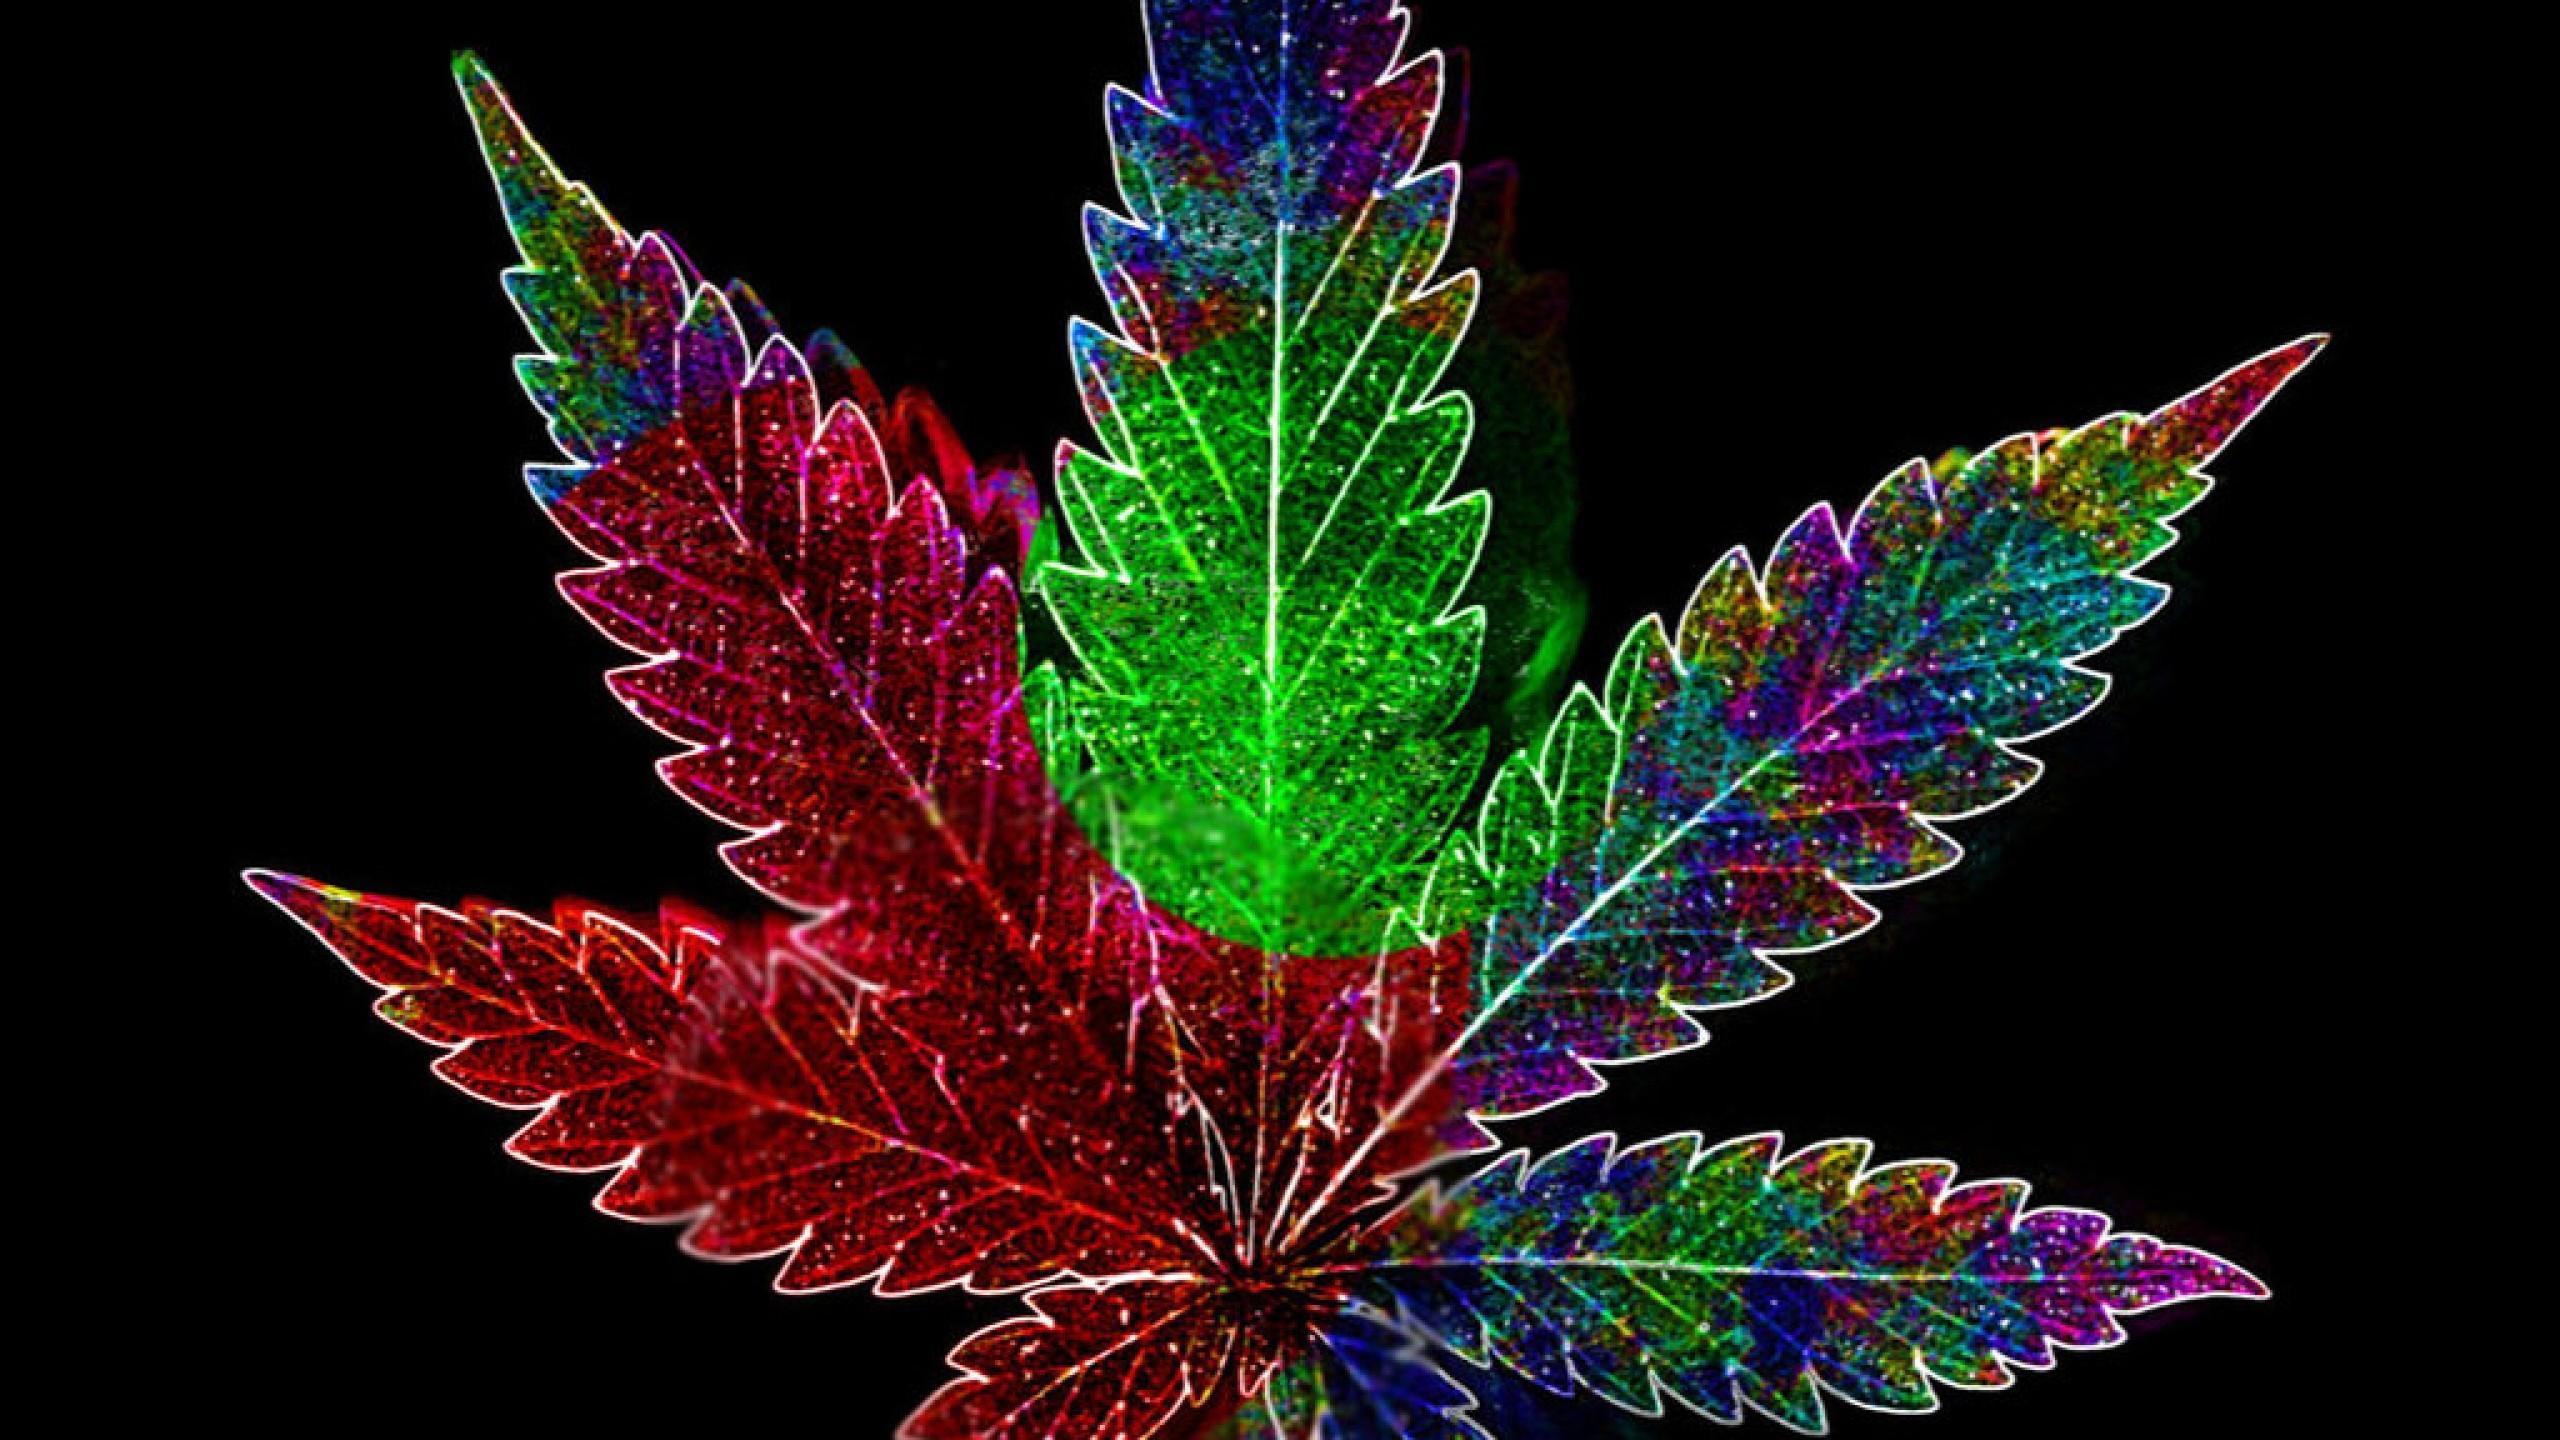 1280x2272 Marijuana Iphone Wallpapers